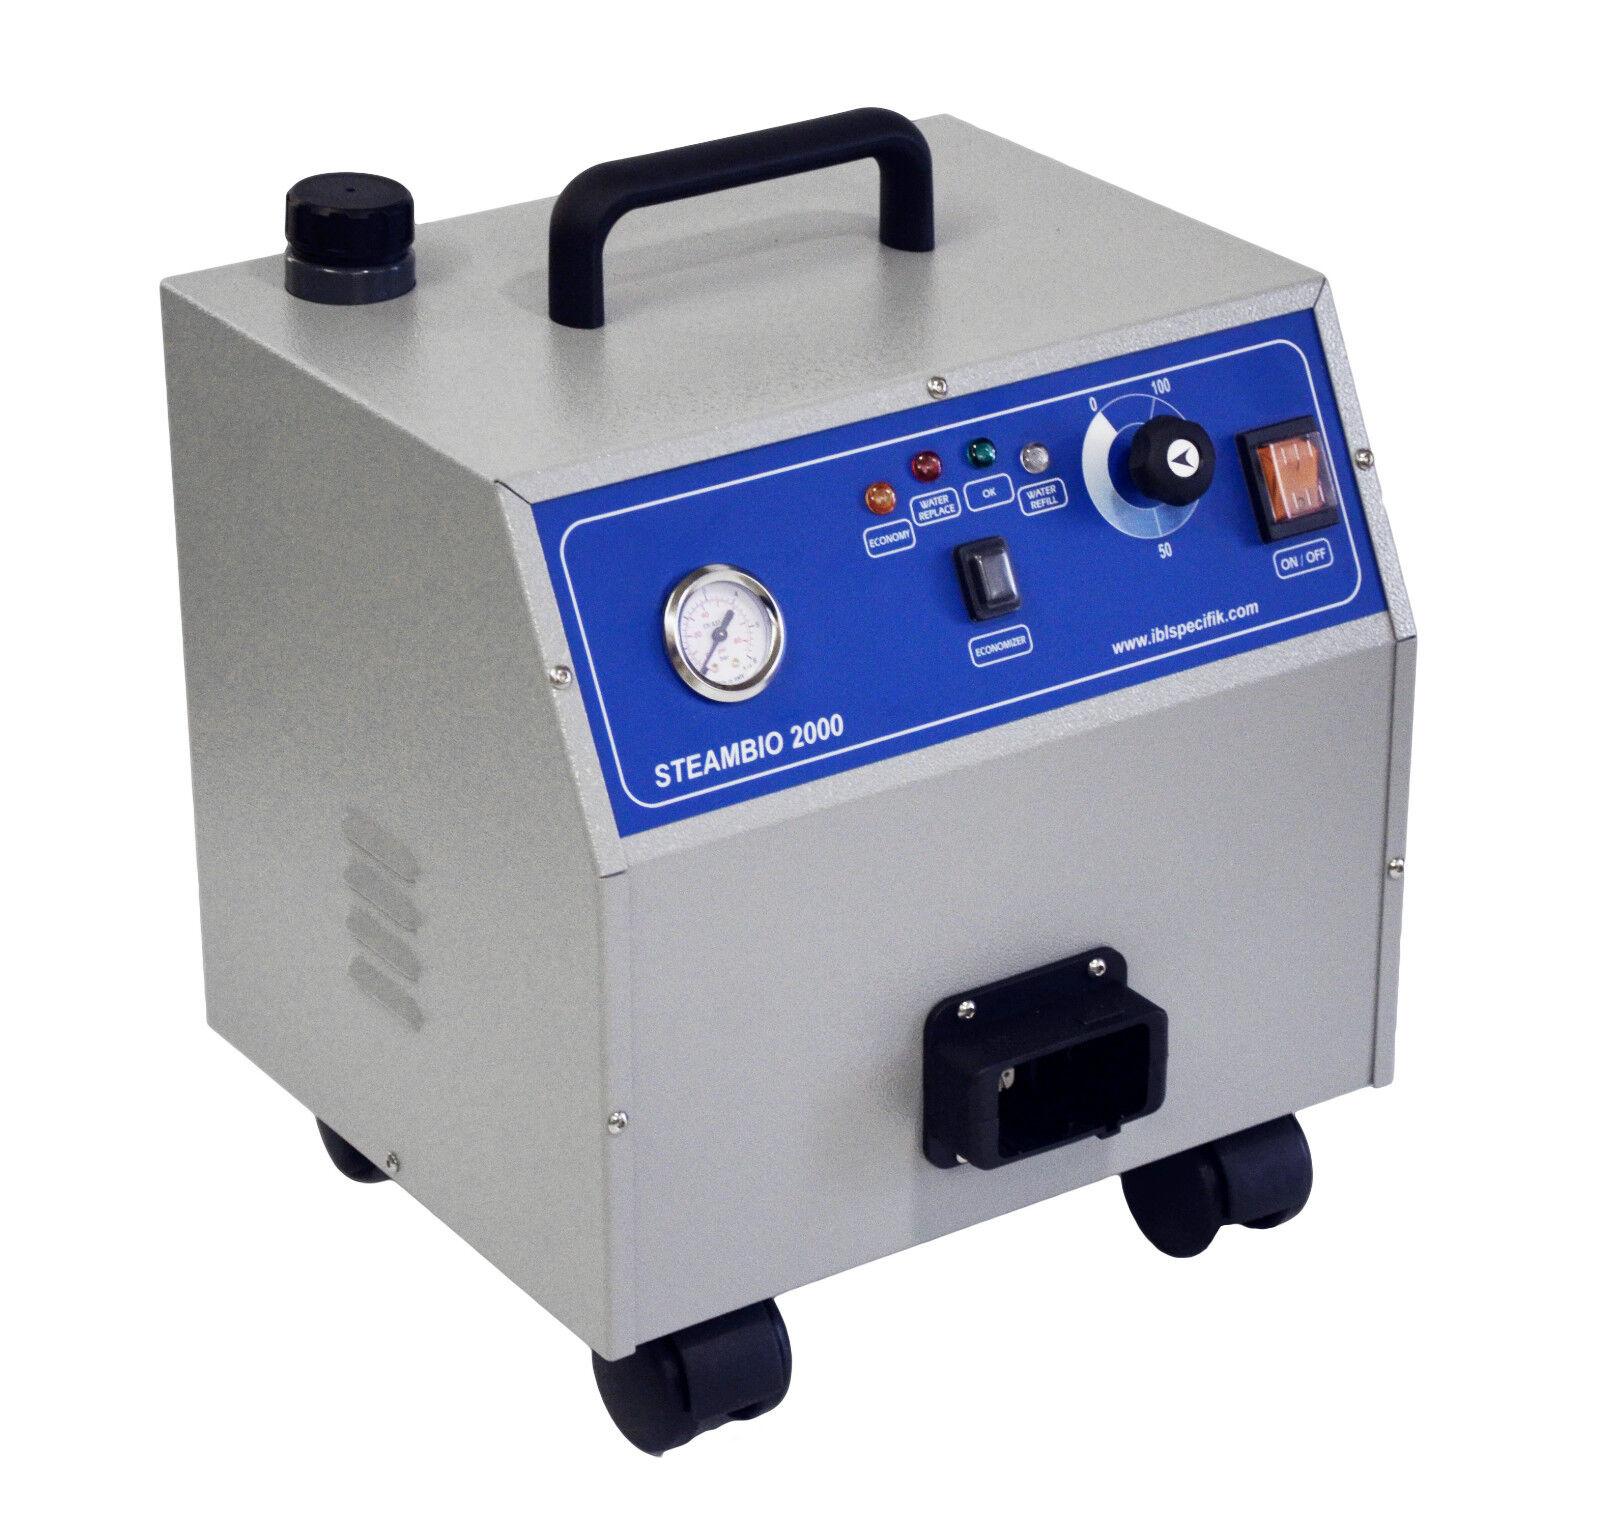 Nettoyeur vapeur Ménager Steambio 2000 métal